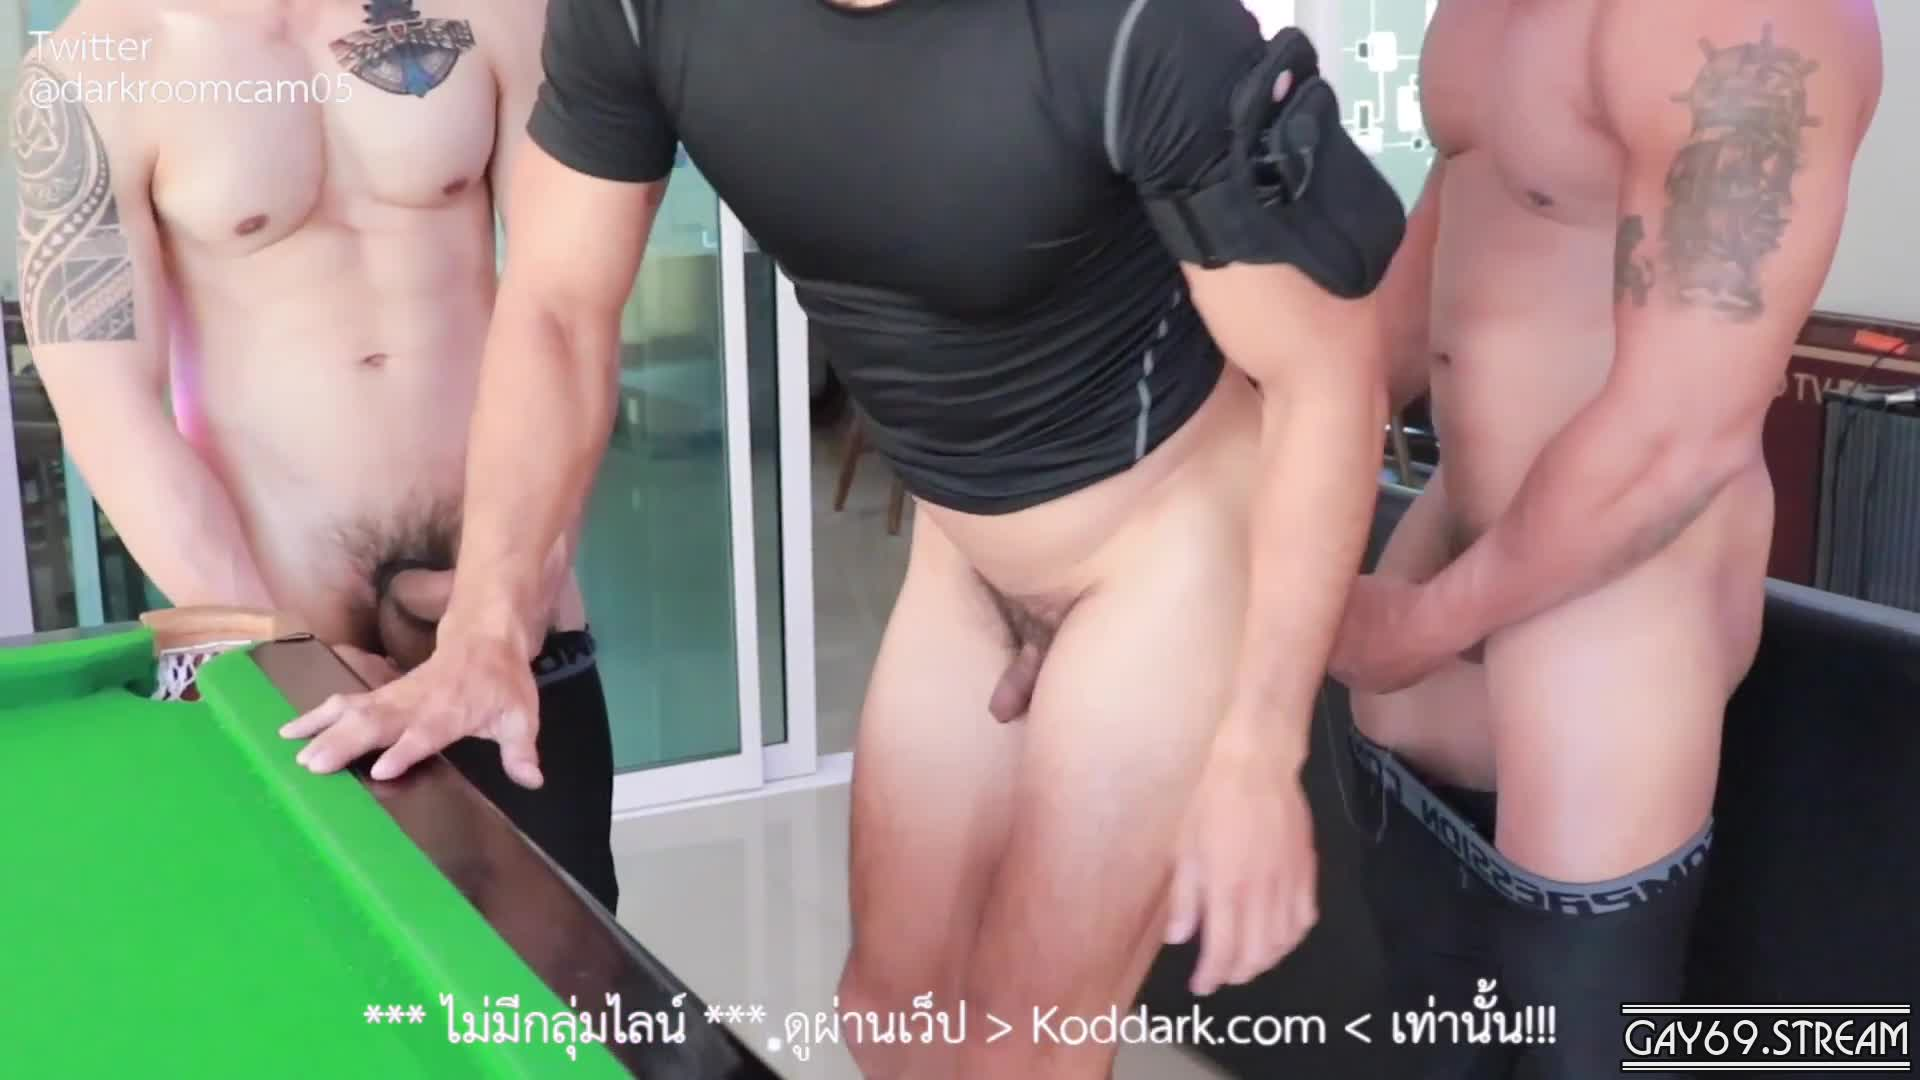 【HD】【OF】 Koddark 87_20210708